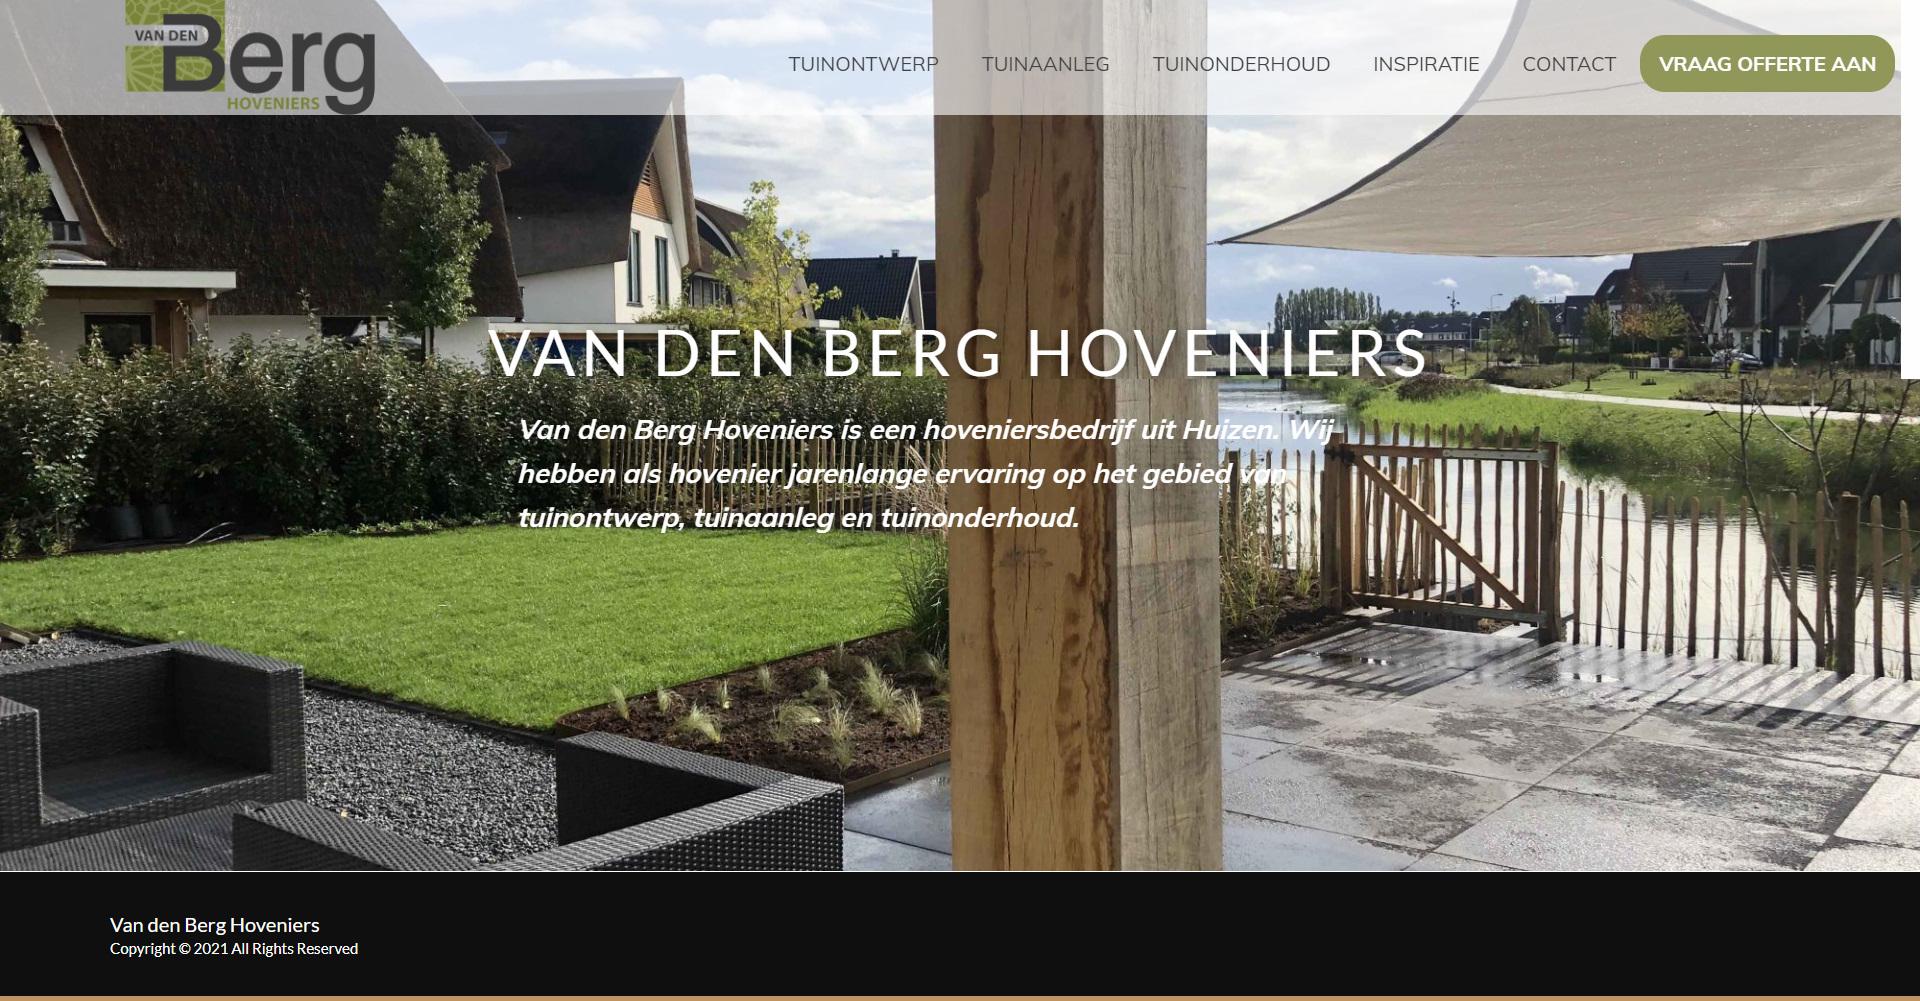 vdbhoveniers.nl